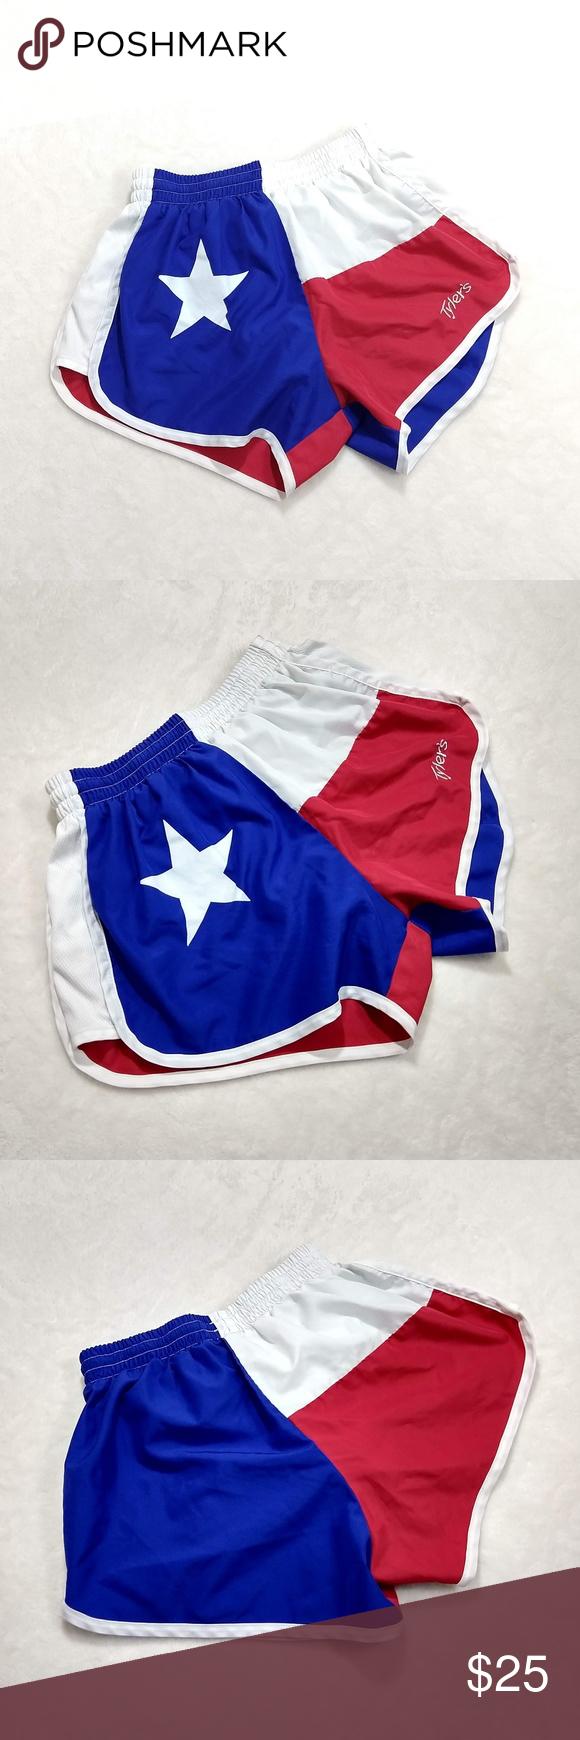 Patriotic Texas Flag Tylers Running Shorts Running Shorts High Waist Fashion Shorts